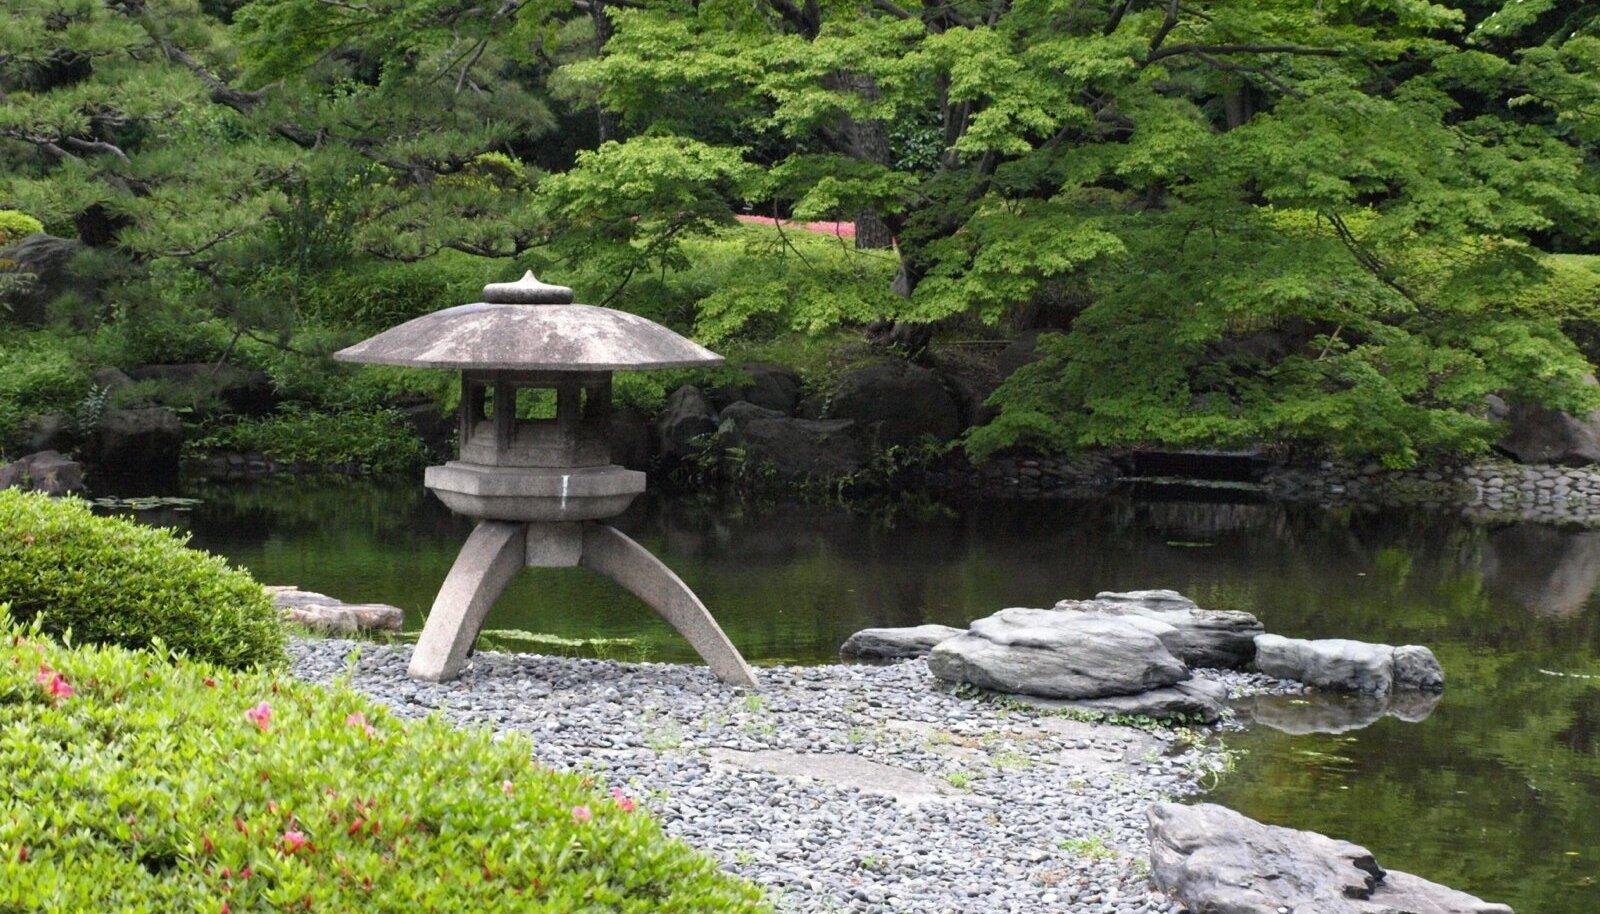 Klassikaline Jaapani kivilatern.